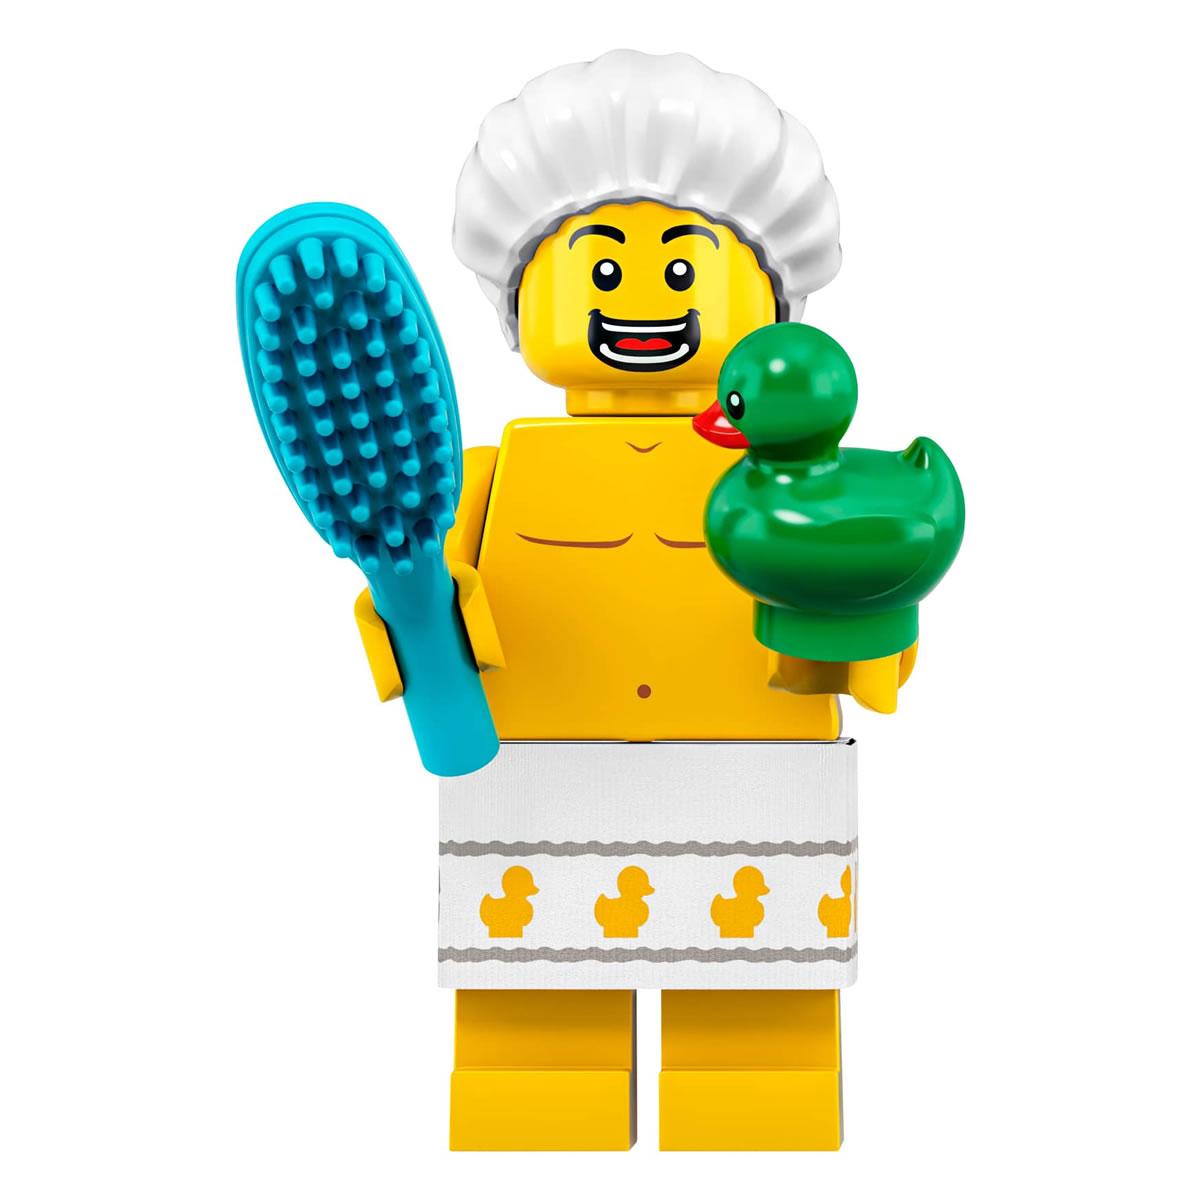 lego-minifiguren-sammelserie-collectible-minifigures-serie-19-71025-2019-5 zusammengebaut.com